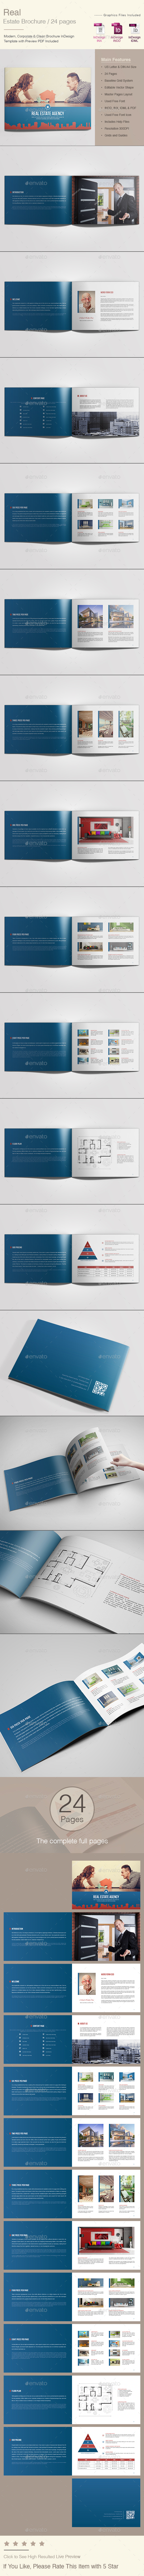 Real Estate Brochure - Catalogs Brochures